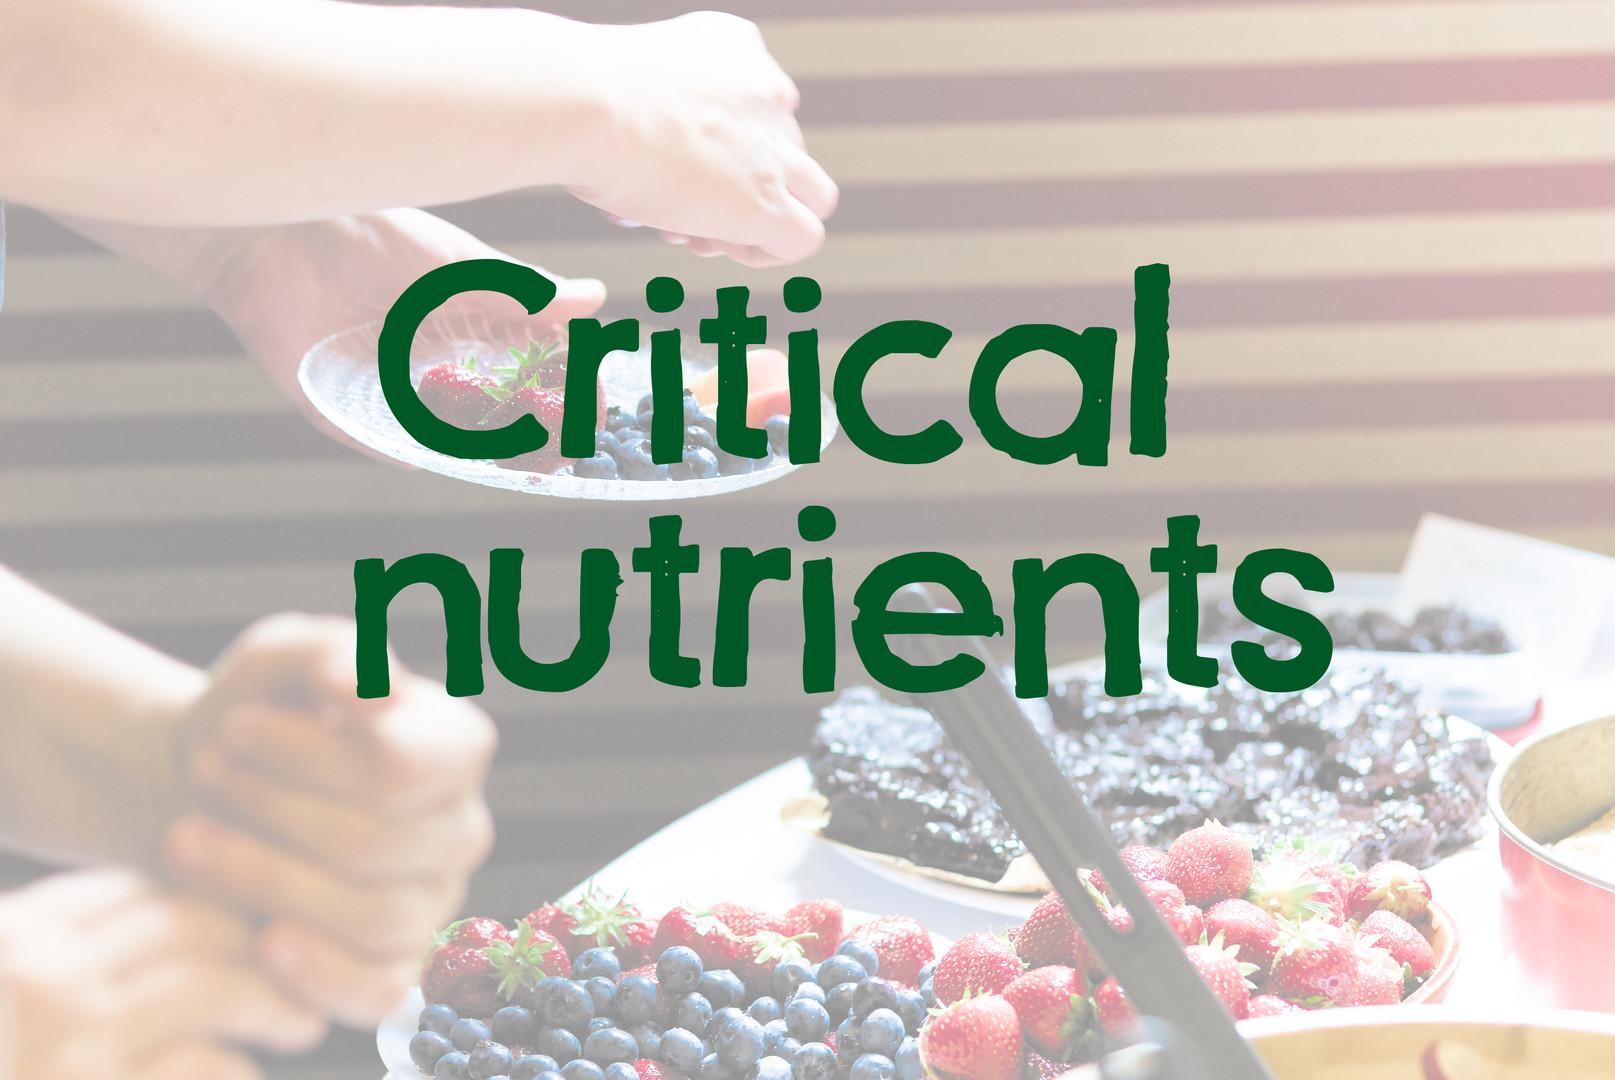 Critical nutrients